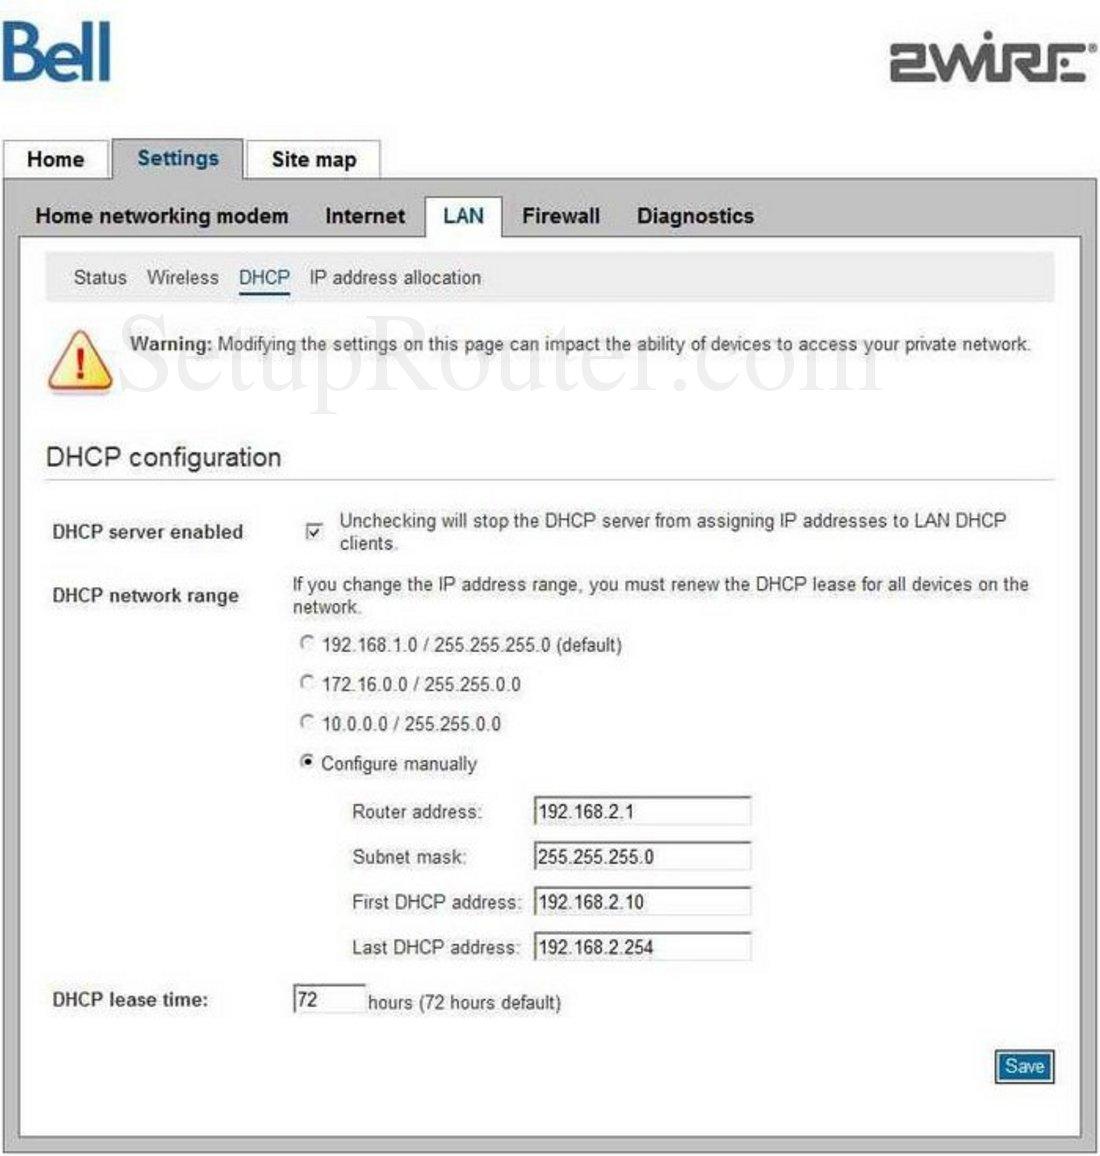 bell home hub 2000 manual